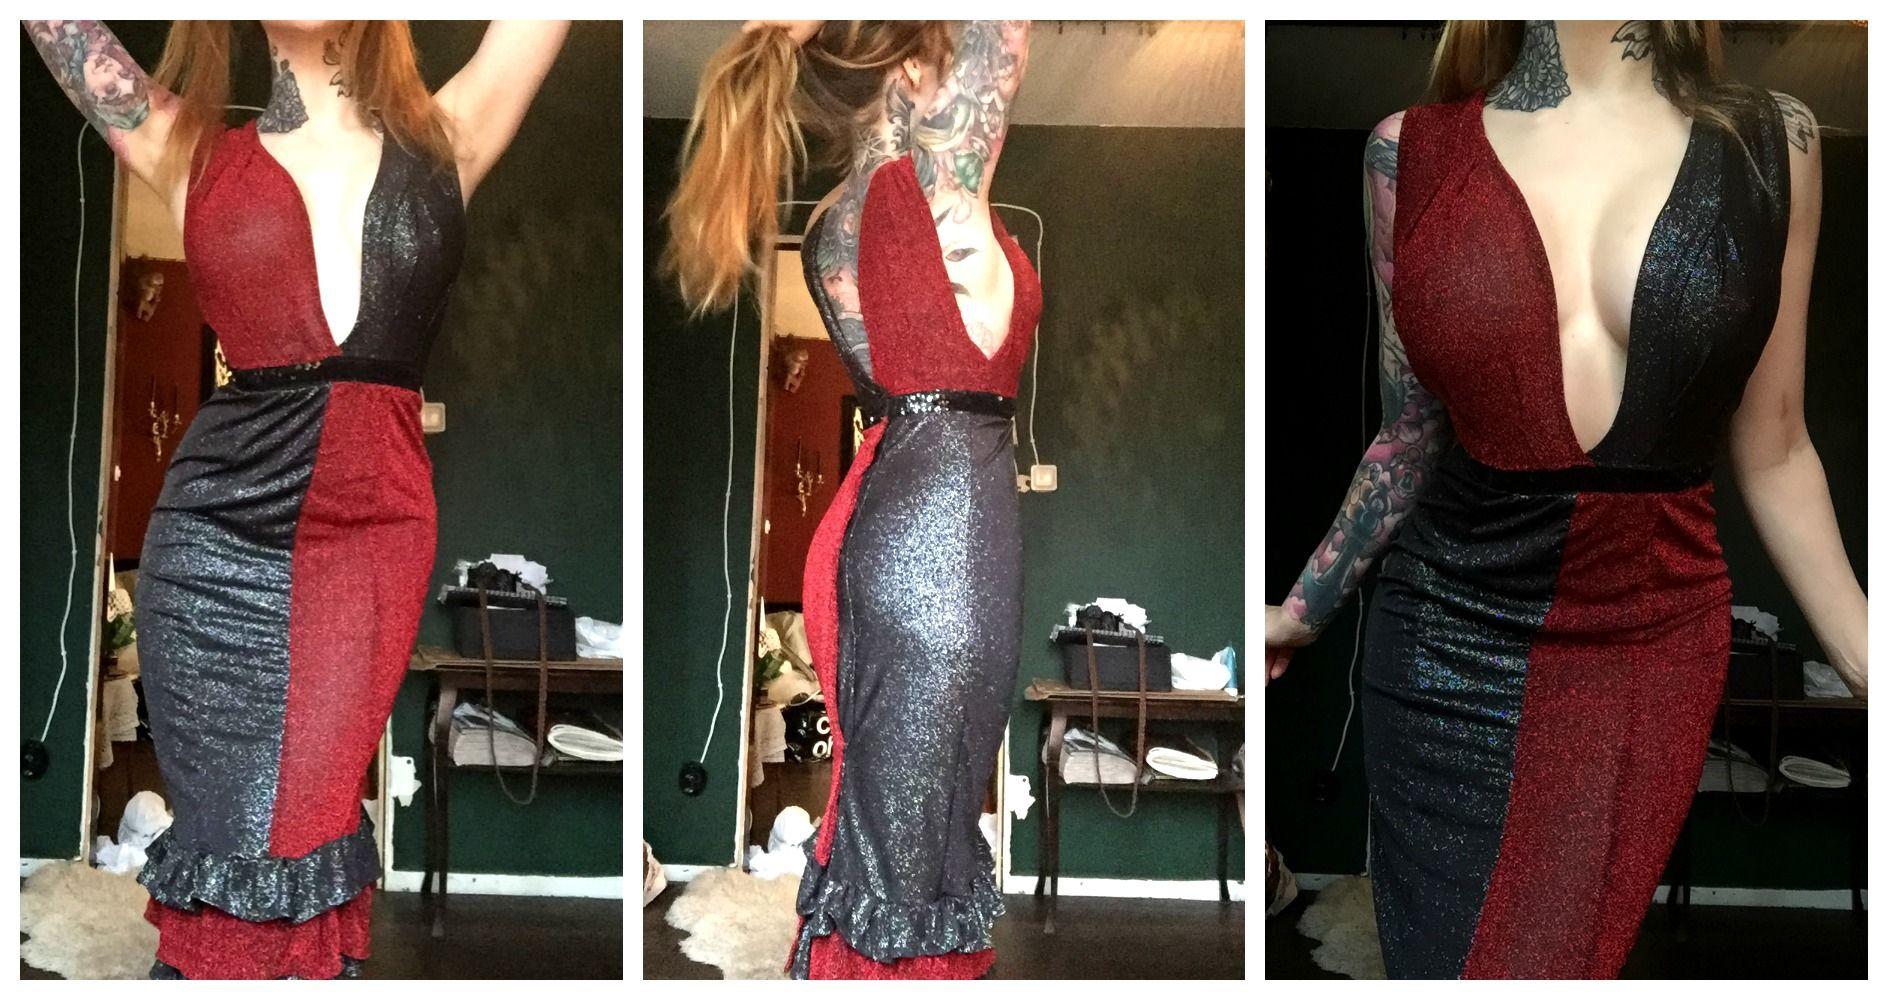 Harley quinn inspired burlesque dress for stripping opens in back